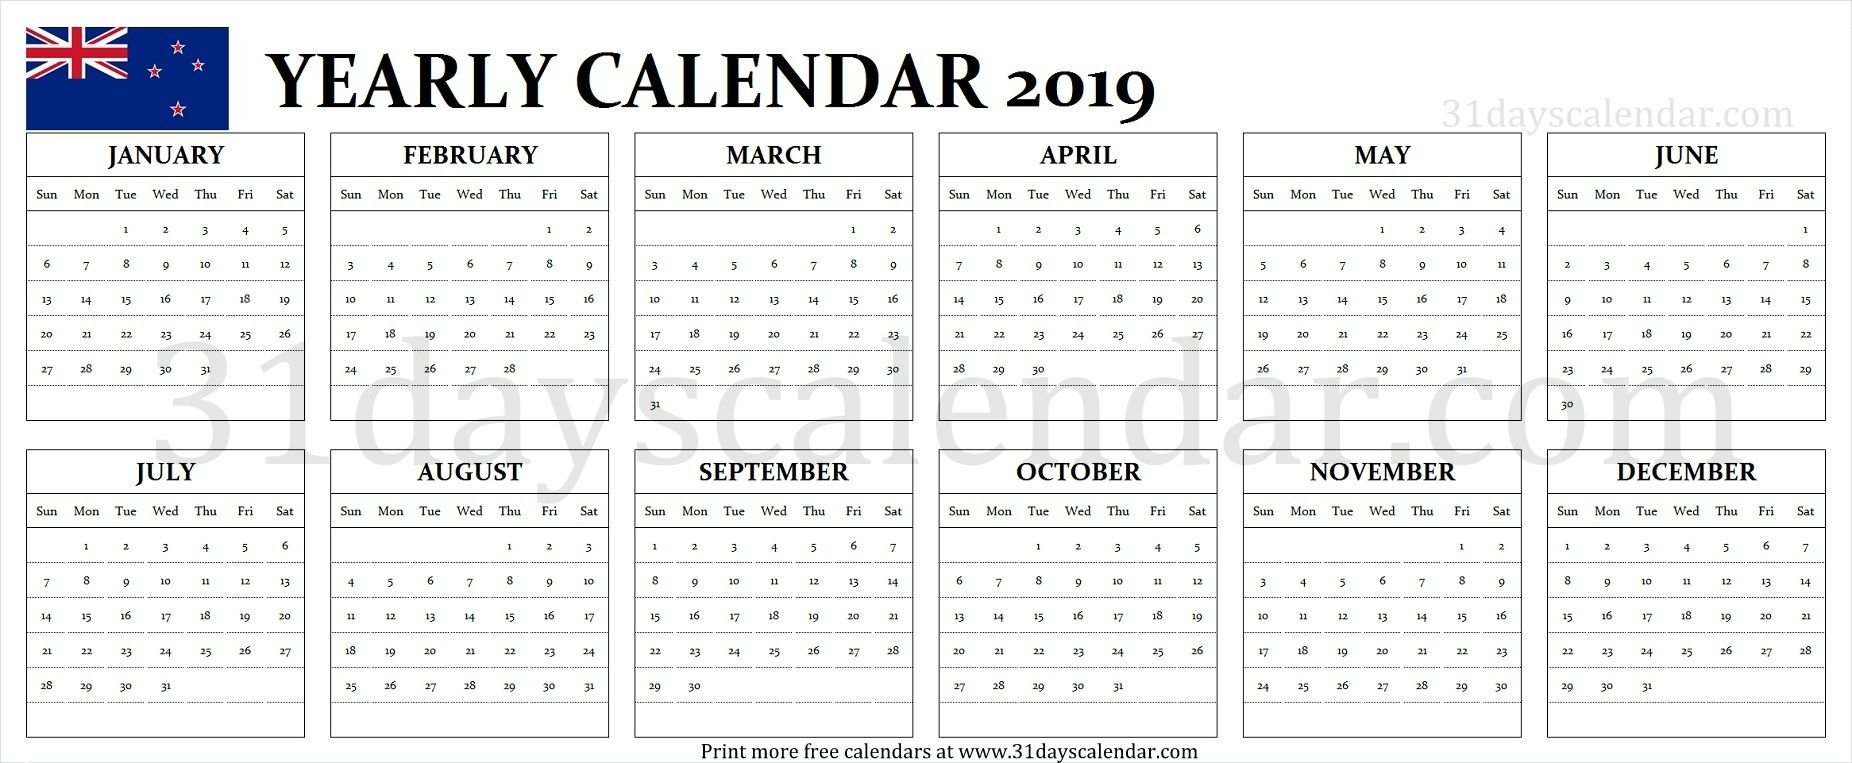 Nz 2019 Calendar | Calendar 2019 Nz | Calendar 2019 Nz, 2019 Calendar 2019 Nz